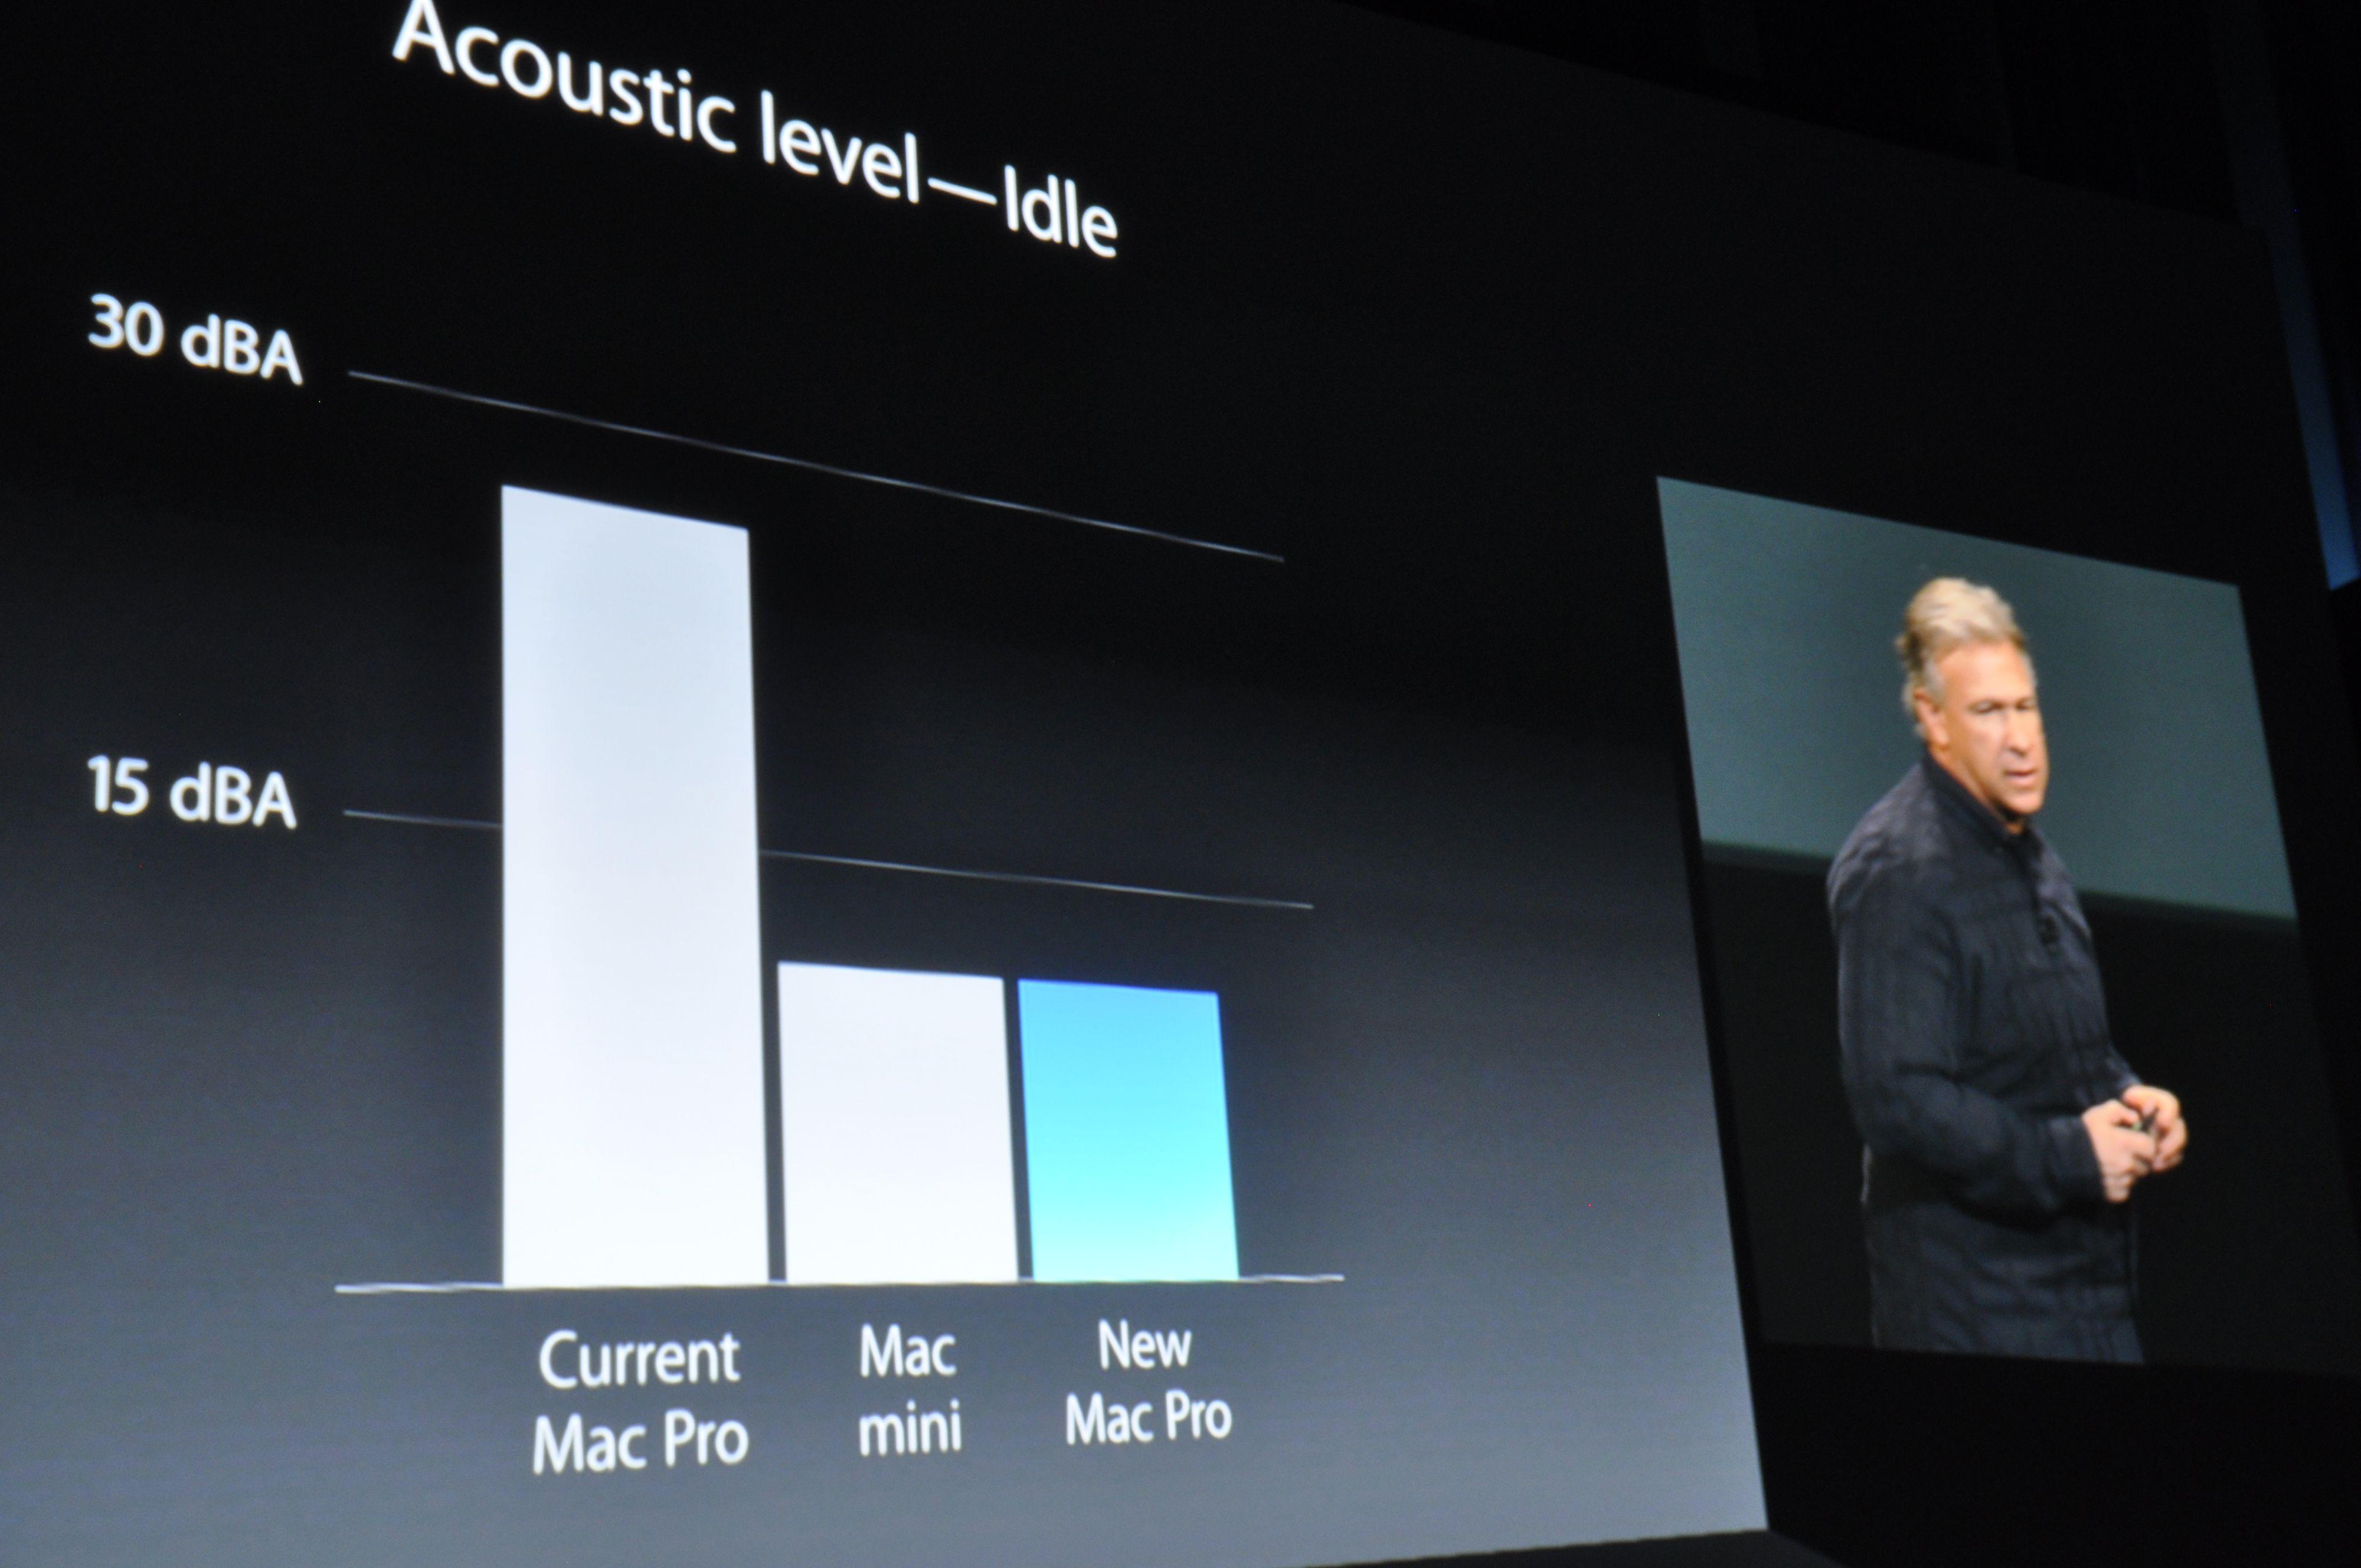 Nye Mac Pro skal være svært støysvak. Foto: Finn Jarle Kvalheim, Amobil.no